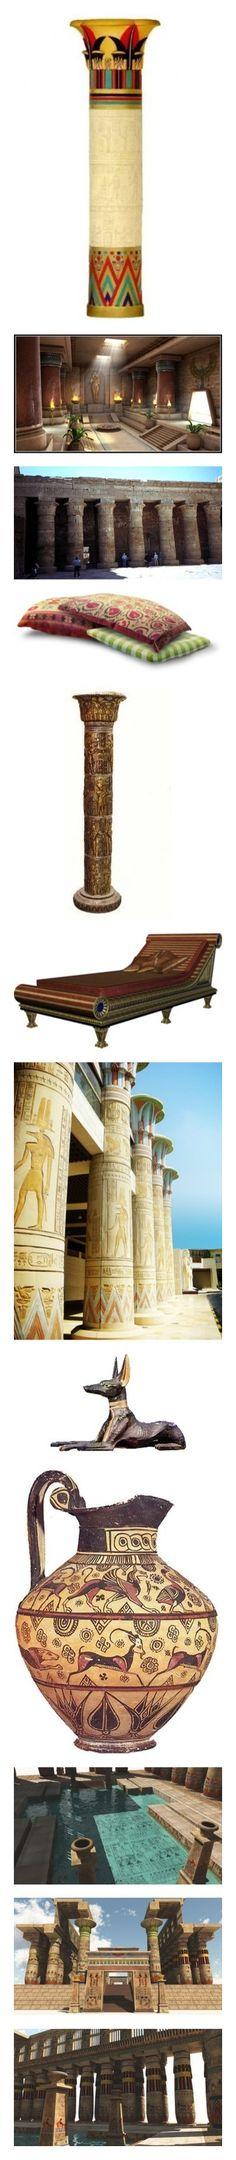 1000 Ideas About Egyptian Home Decor On Pinterest